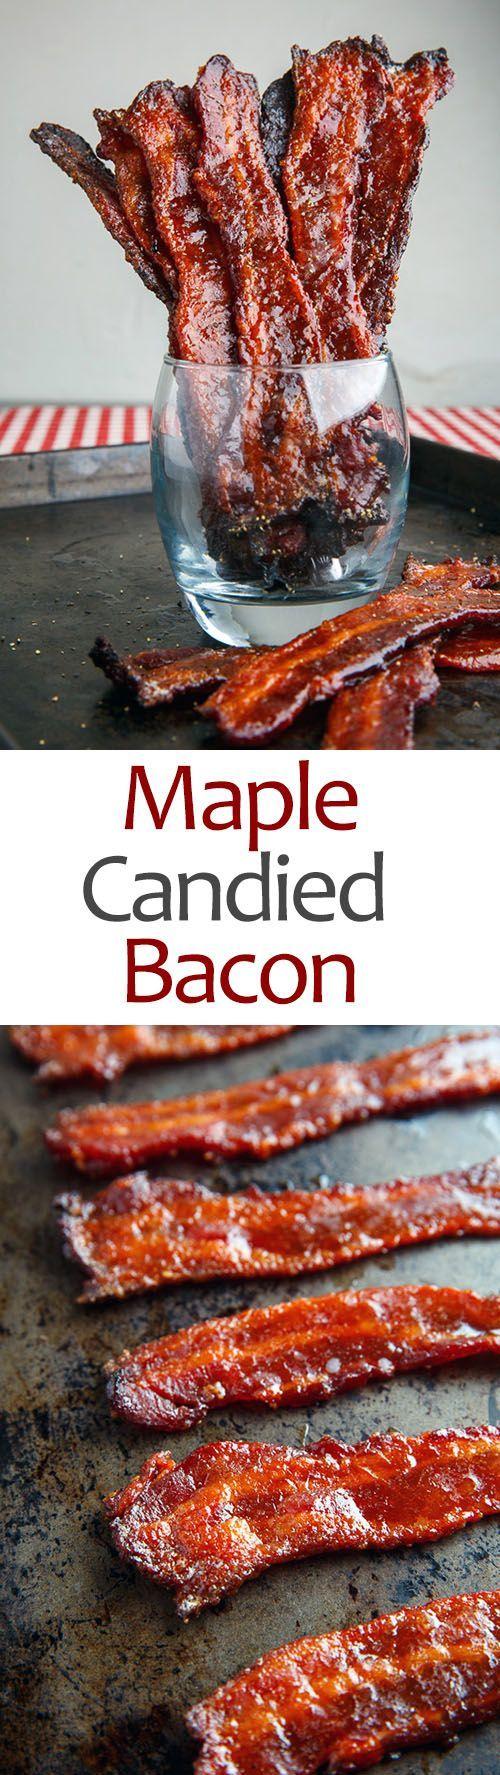 Maple Candied Bacon #brownsugar